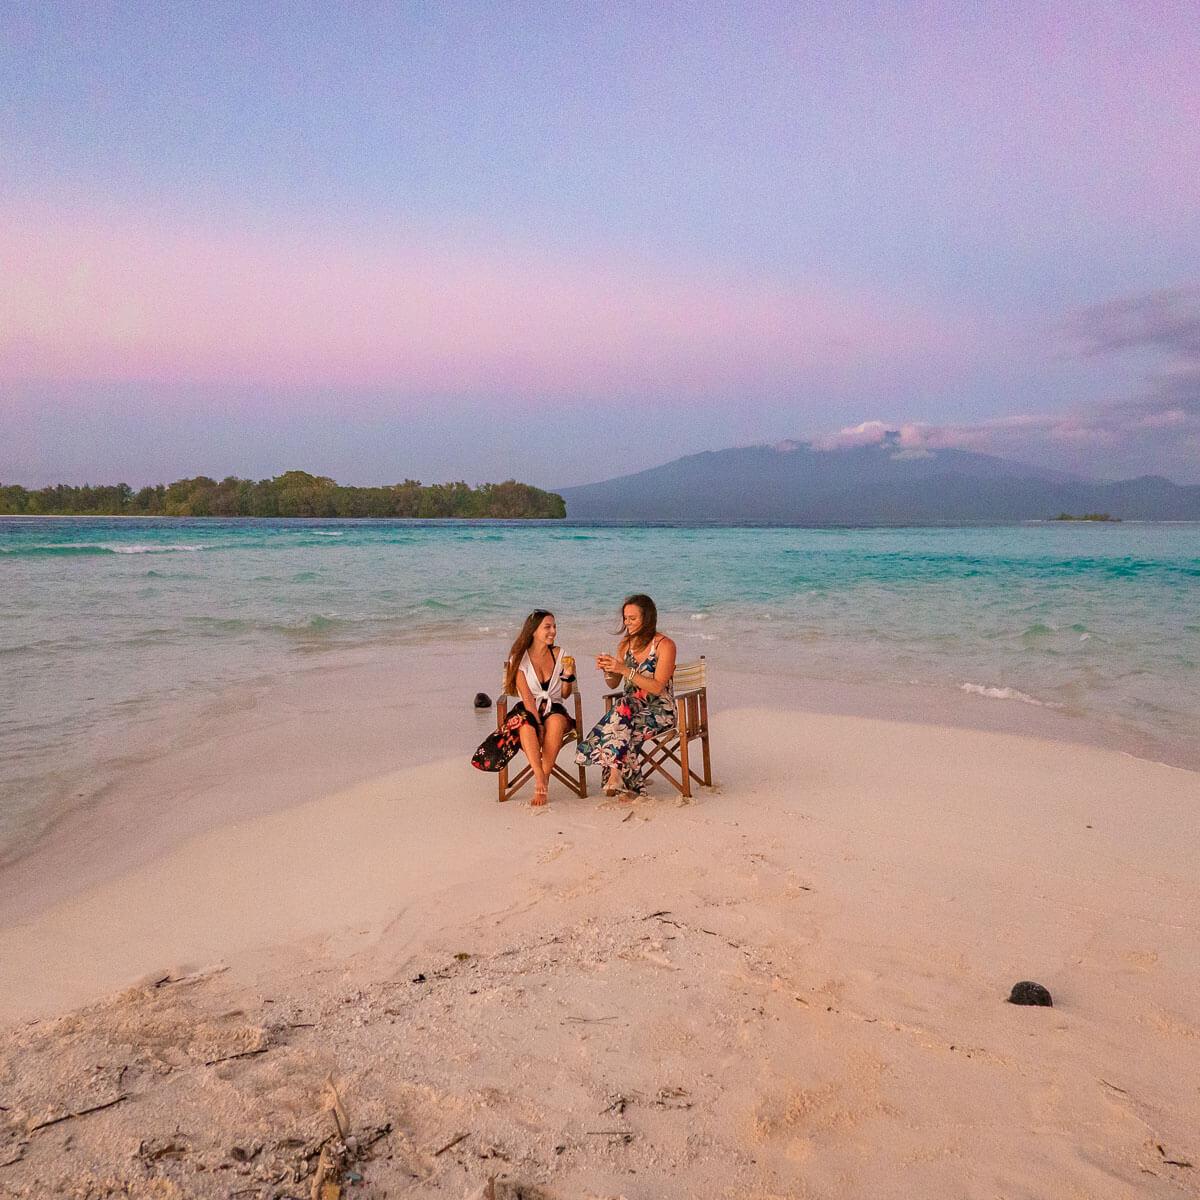 sunset wine down gizo solomon islands beach sunset